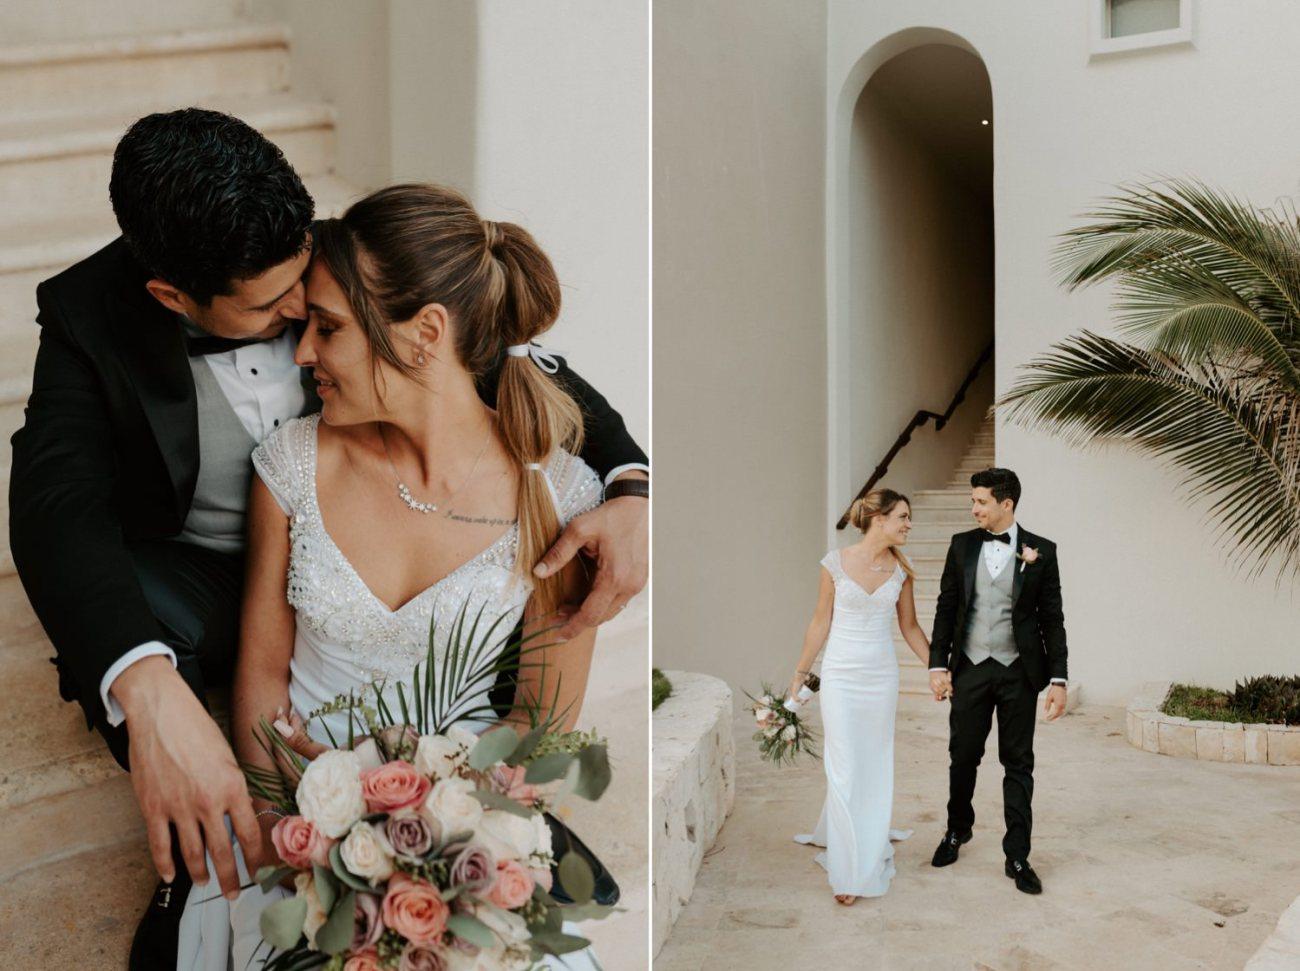 Cancun Destination Wedding Mexico Tulum Wedding Photographer Anais Possamai Photography 052